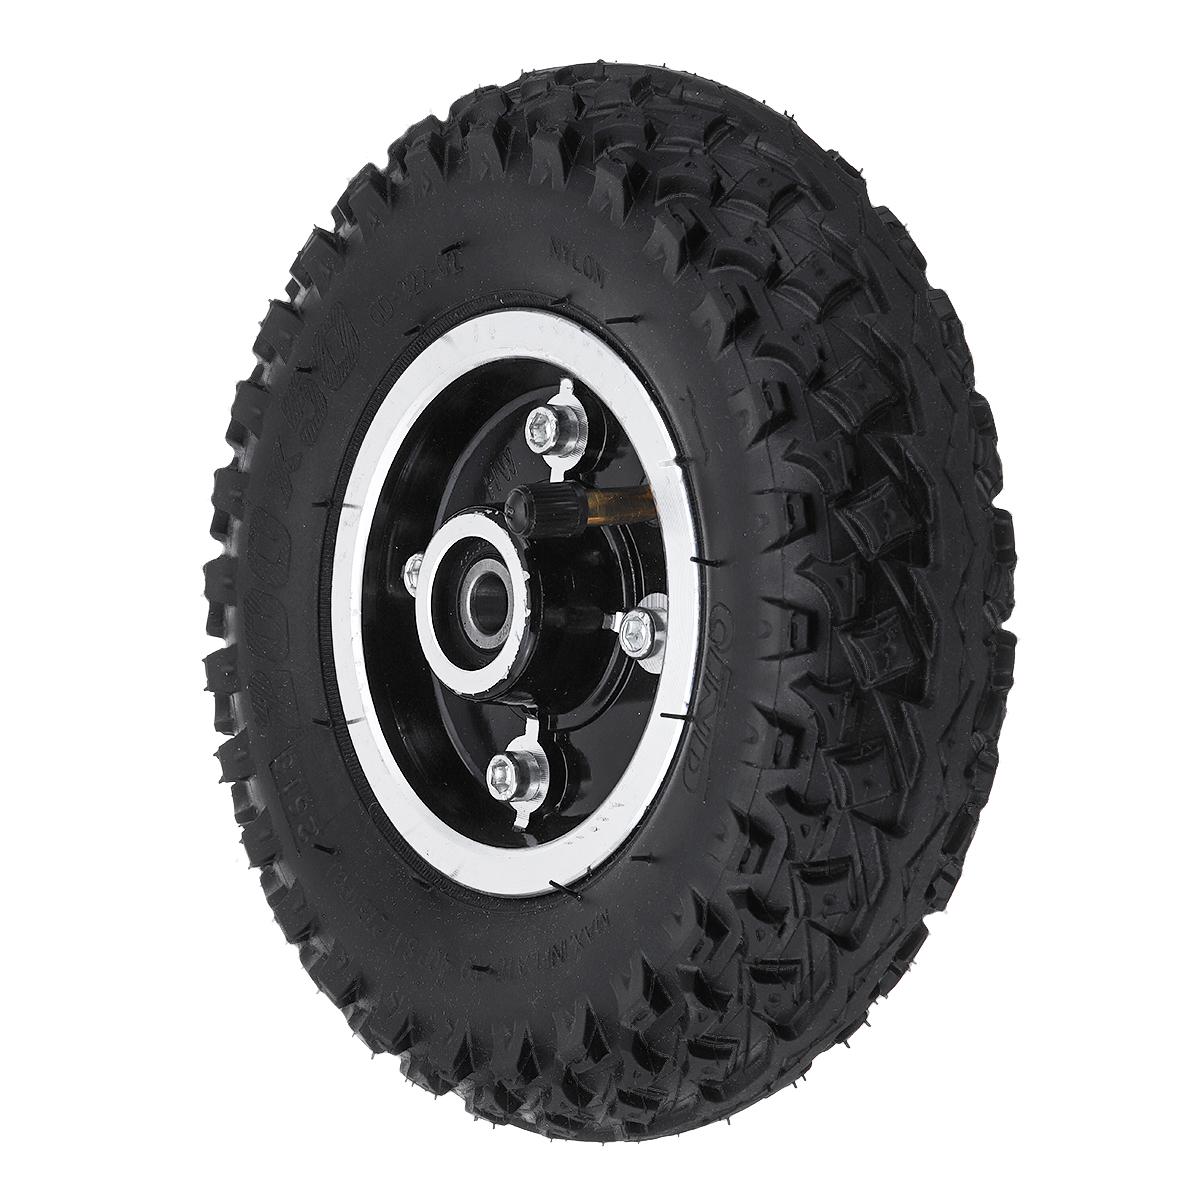 200*50mm Inflatable Longboard Off Road Gears Wheel For Electrical Skateboard